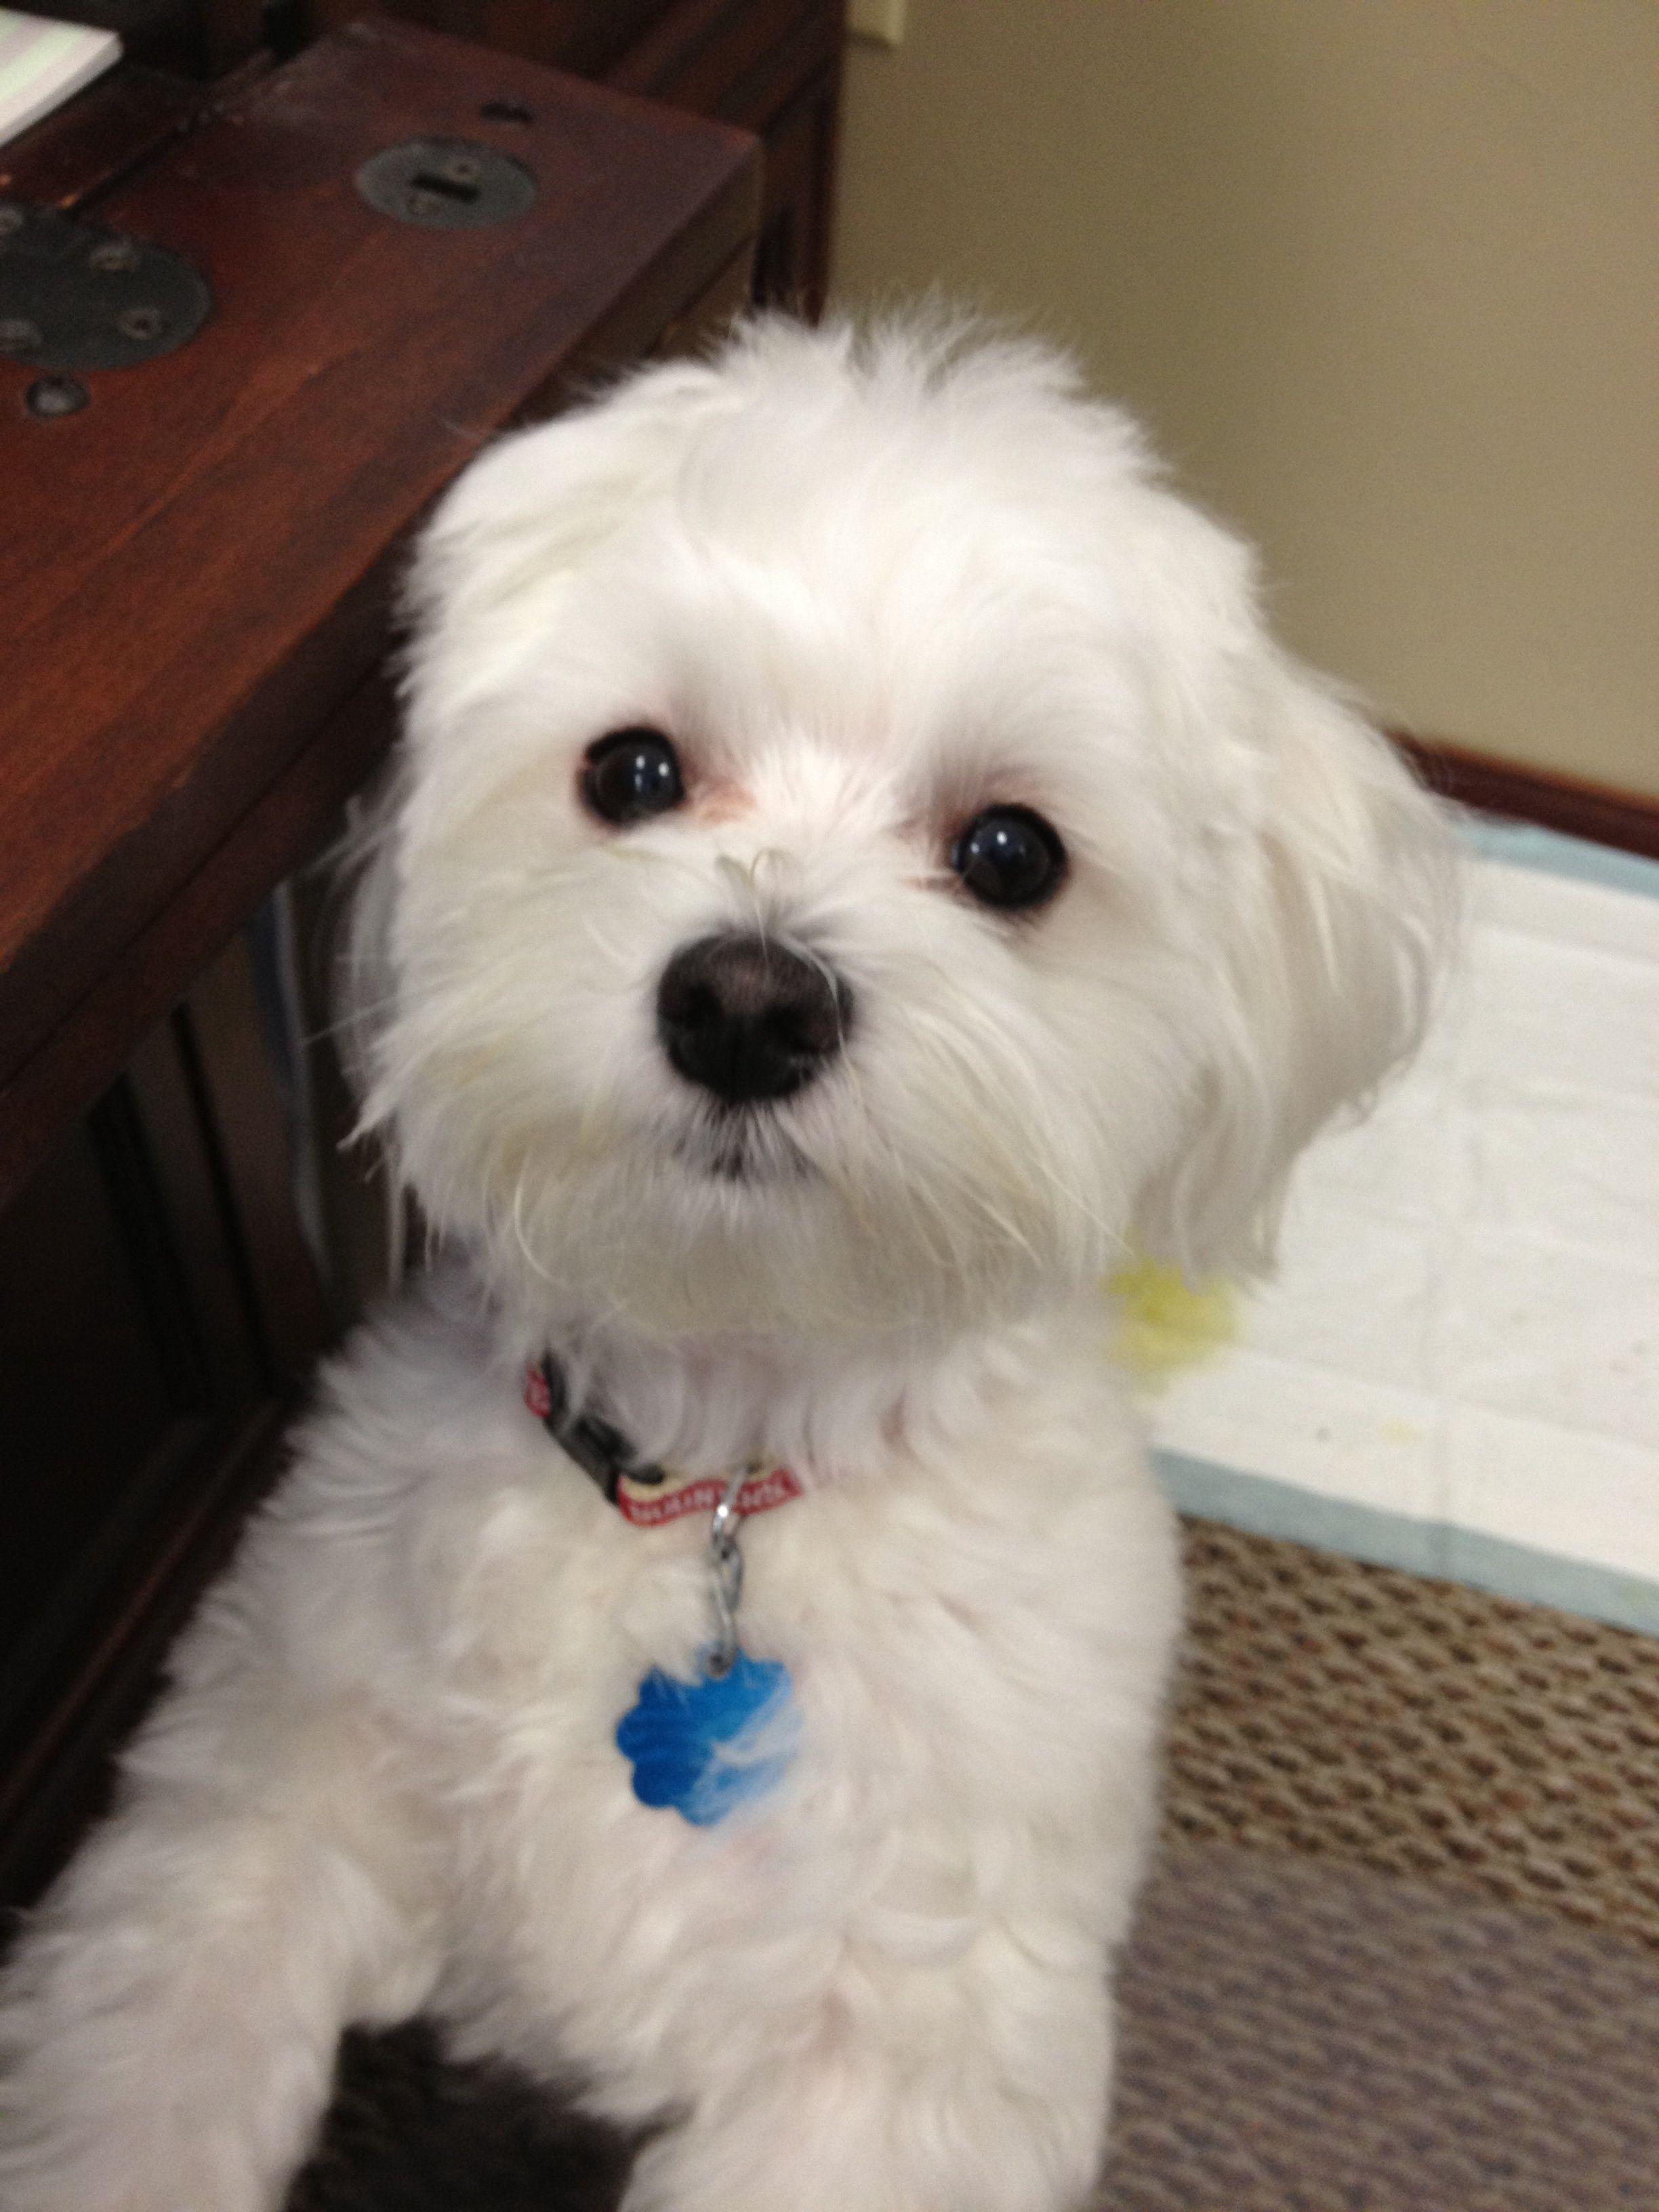 What A Precious Little Face Tiere Hund Hunde Malteser